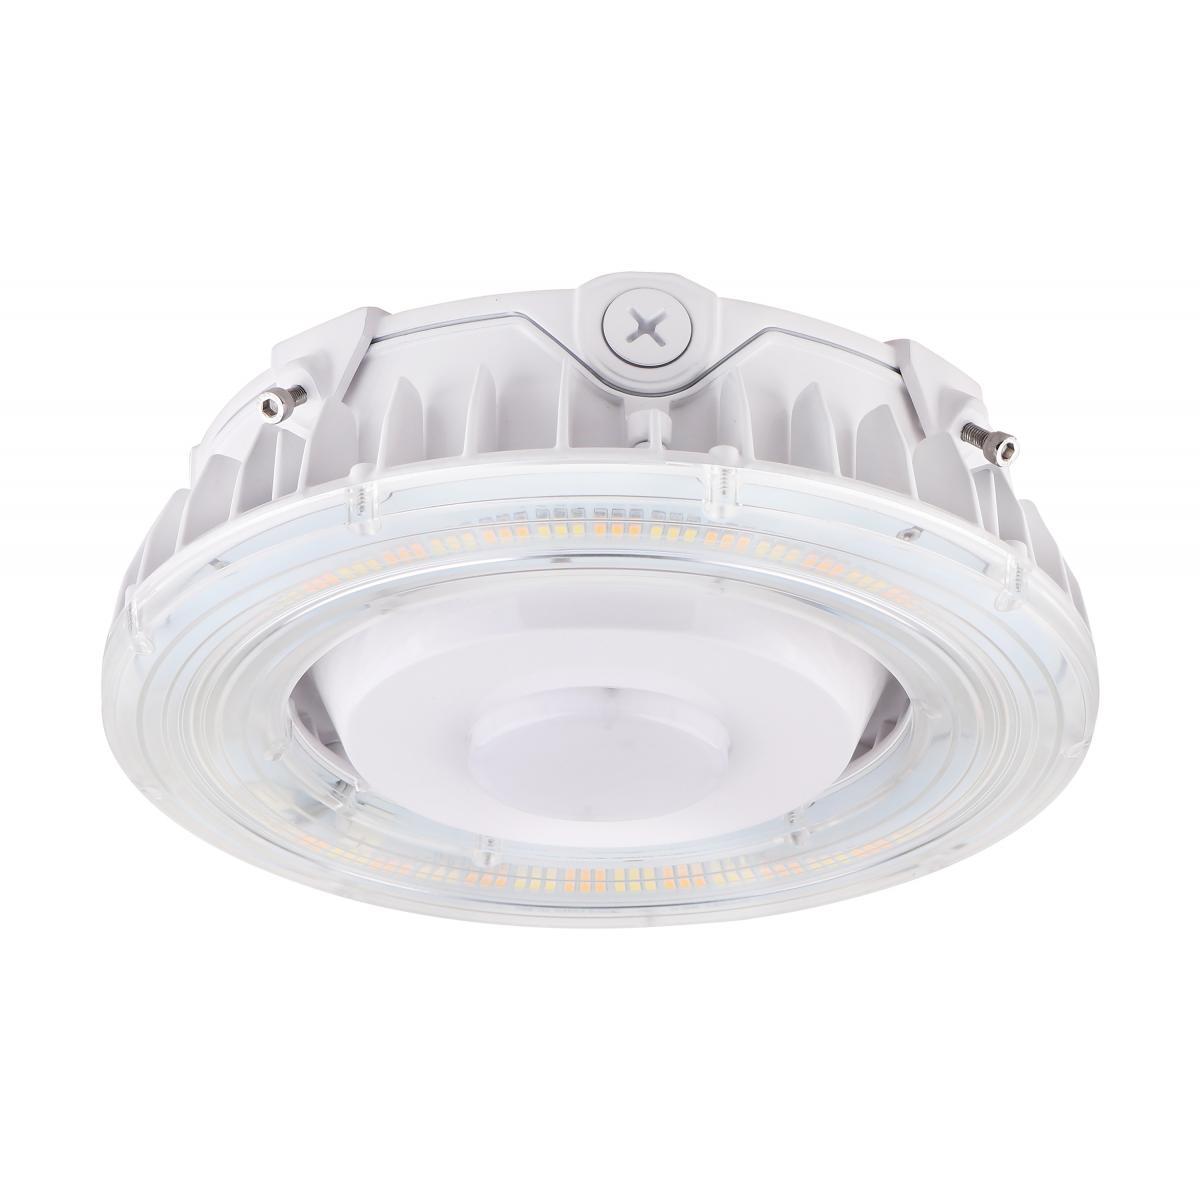 65-631 100W LED CANOPY LIGHT